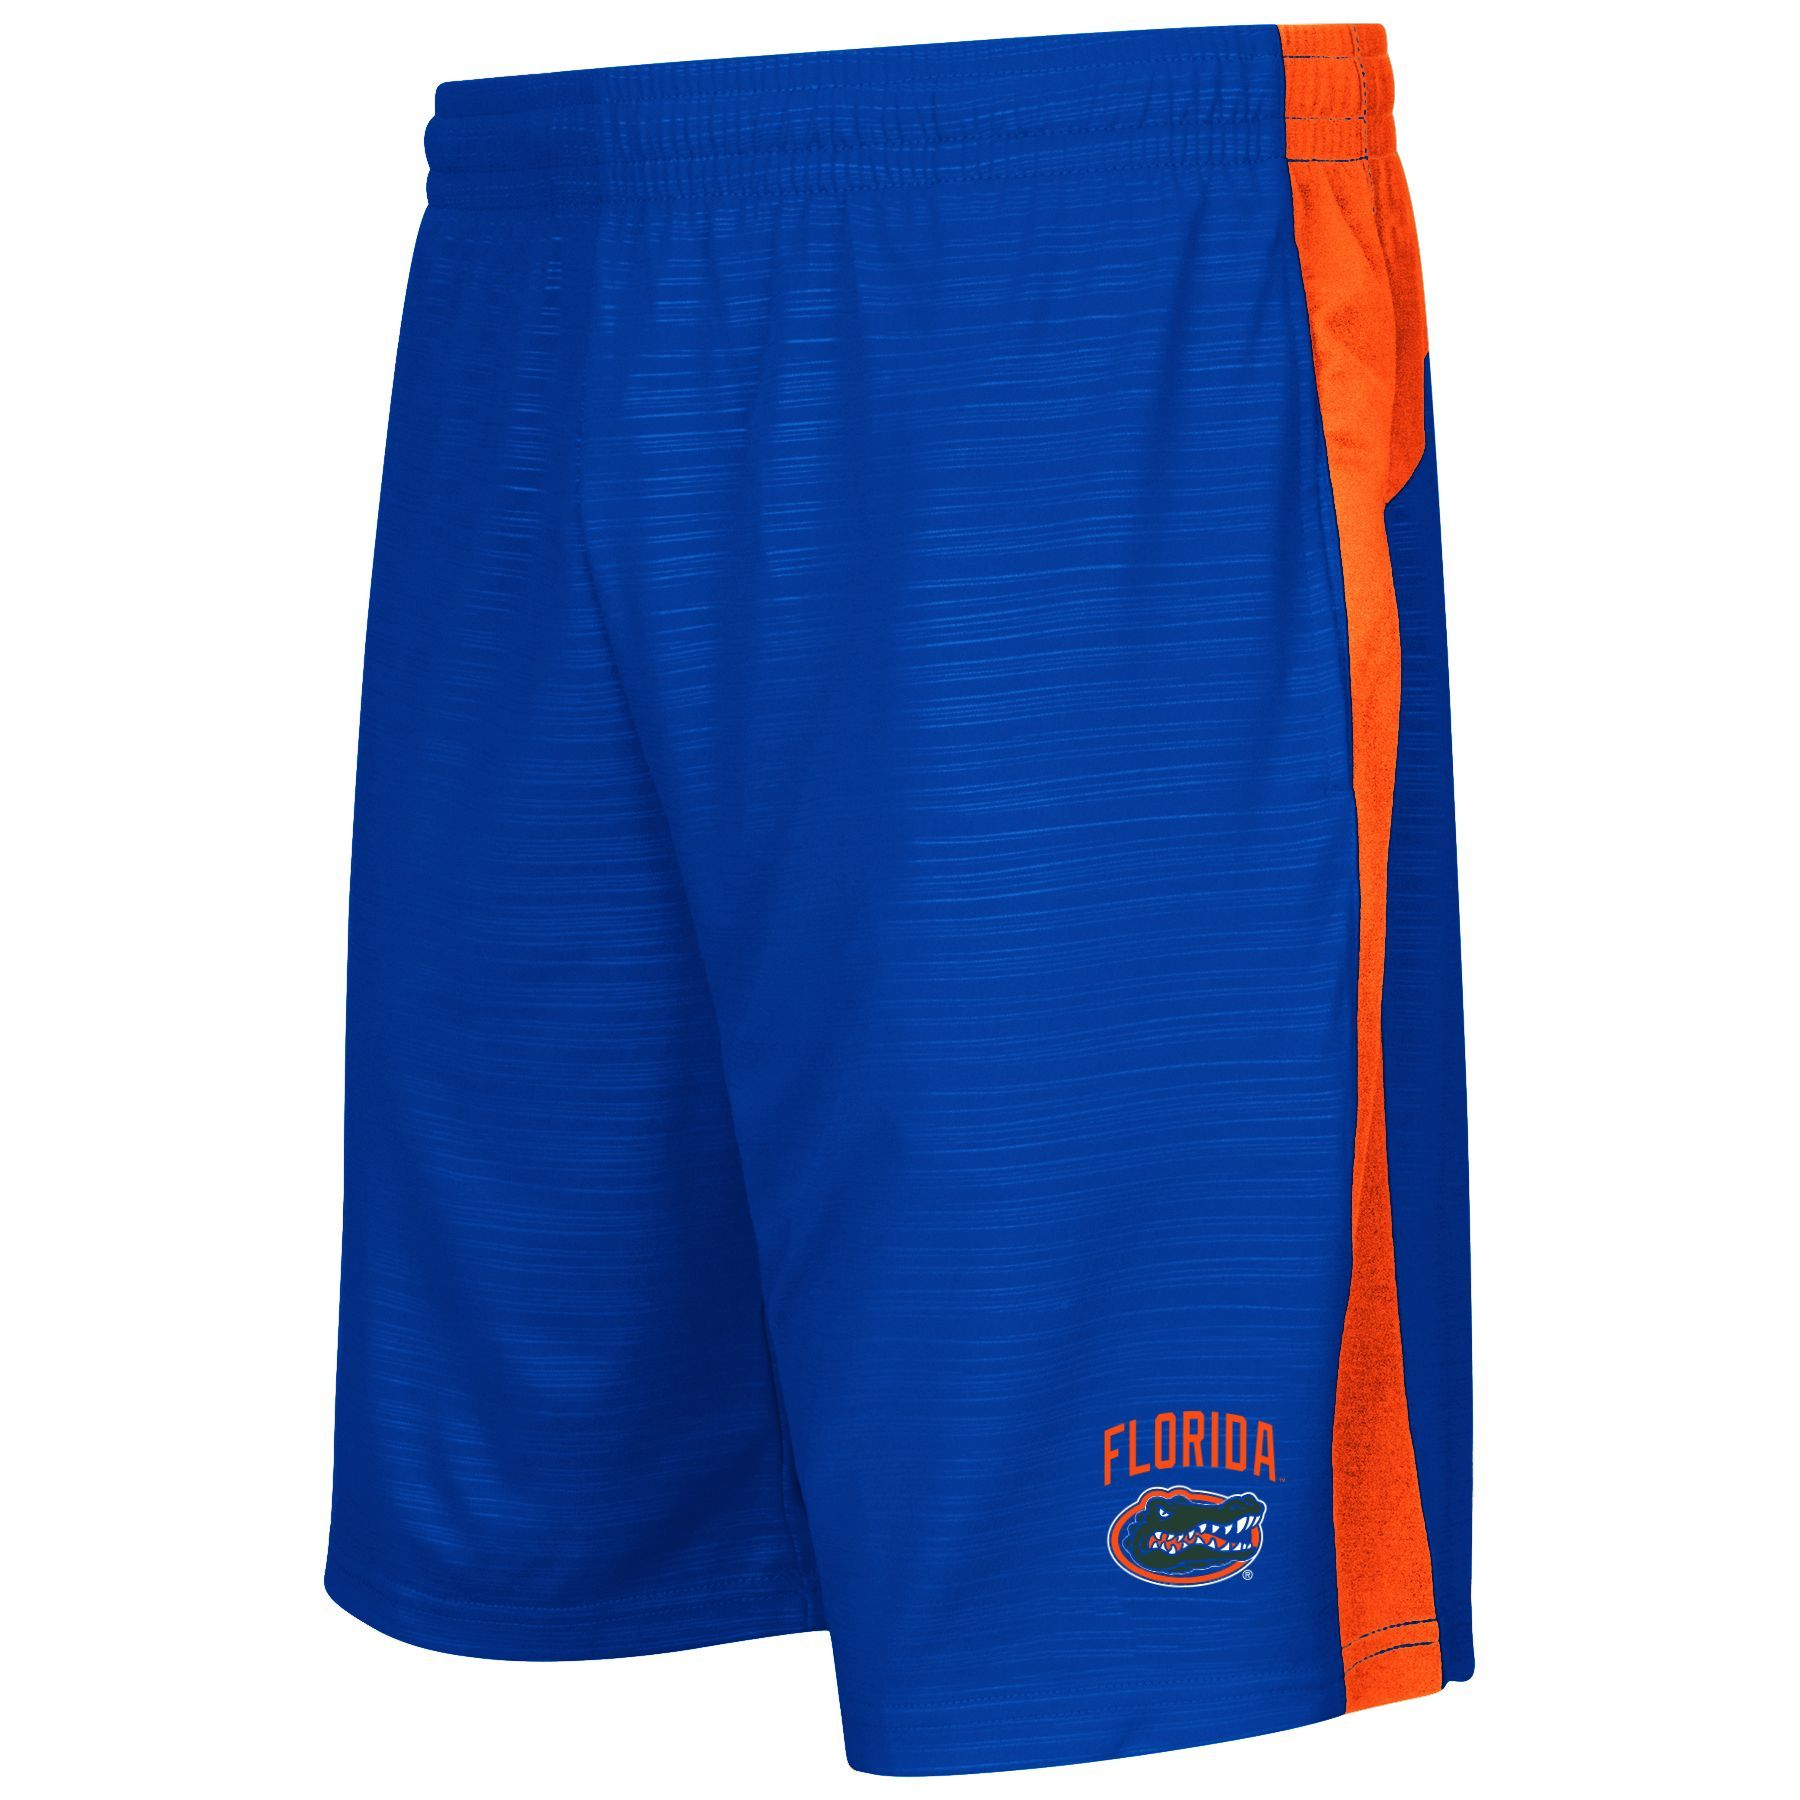 Vendor: Colosseum         Type: Shorts         Price:              34.00